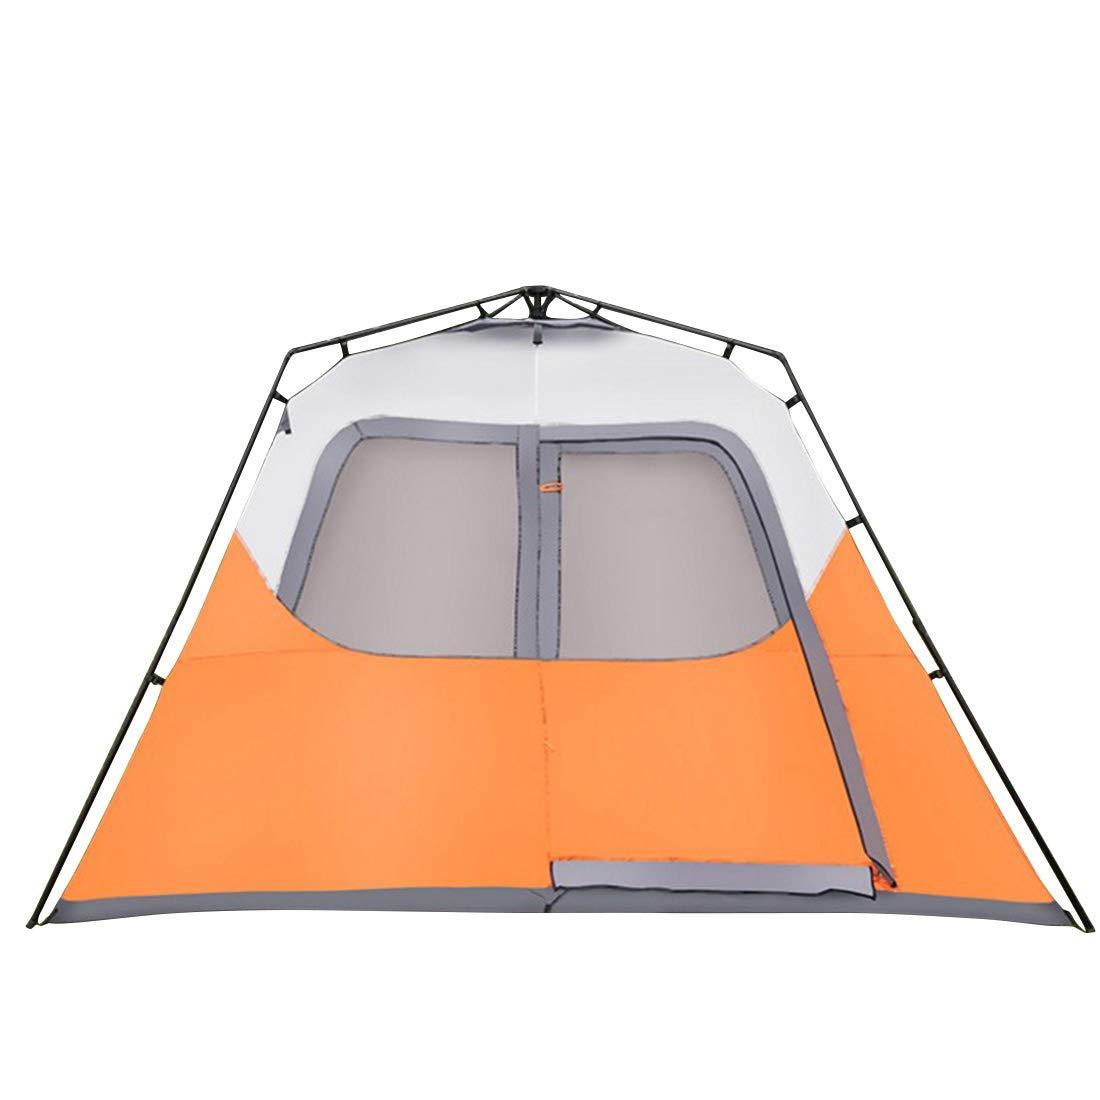 LilyAngel 屋外5-8人ダブルデッキ防風性と防雨性の自動テント 5-8P  B07MXGM5HX